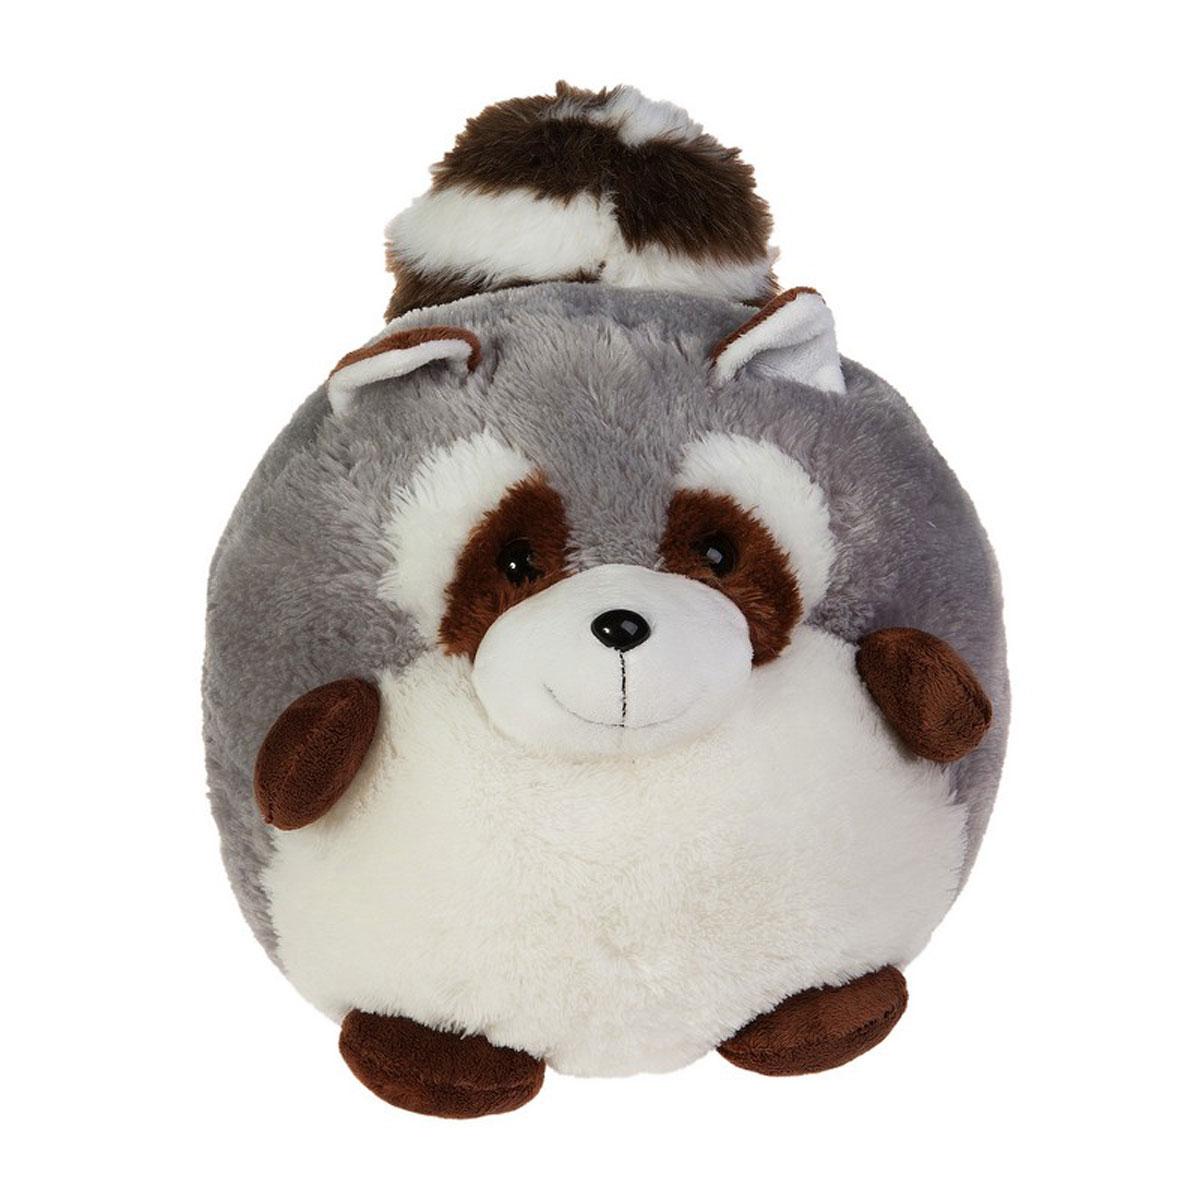 Gulliver Мягкая игрушка Енотик 30 см мягкие игрушки gulliver игрушка перевертыш лисичка корова 35 см